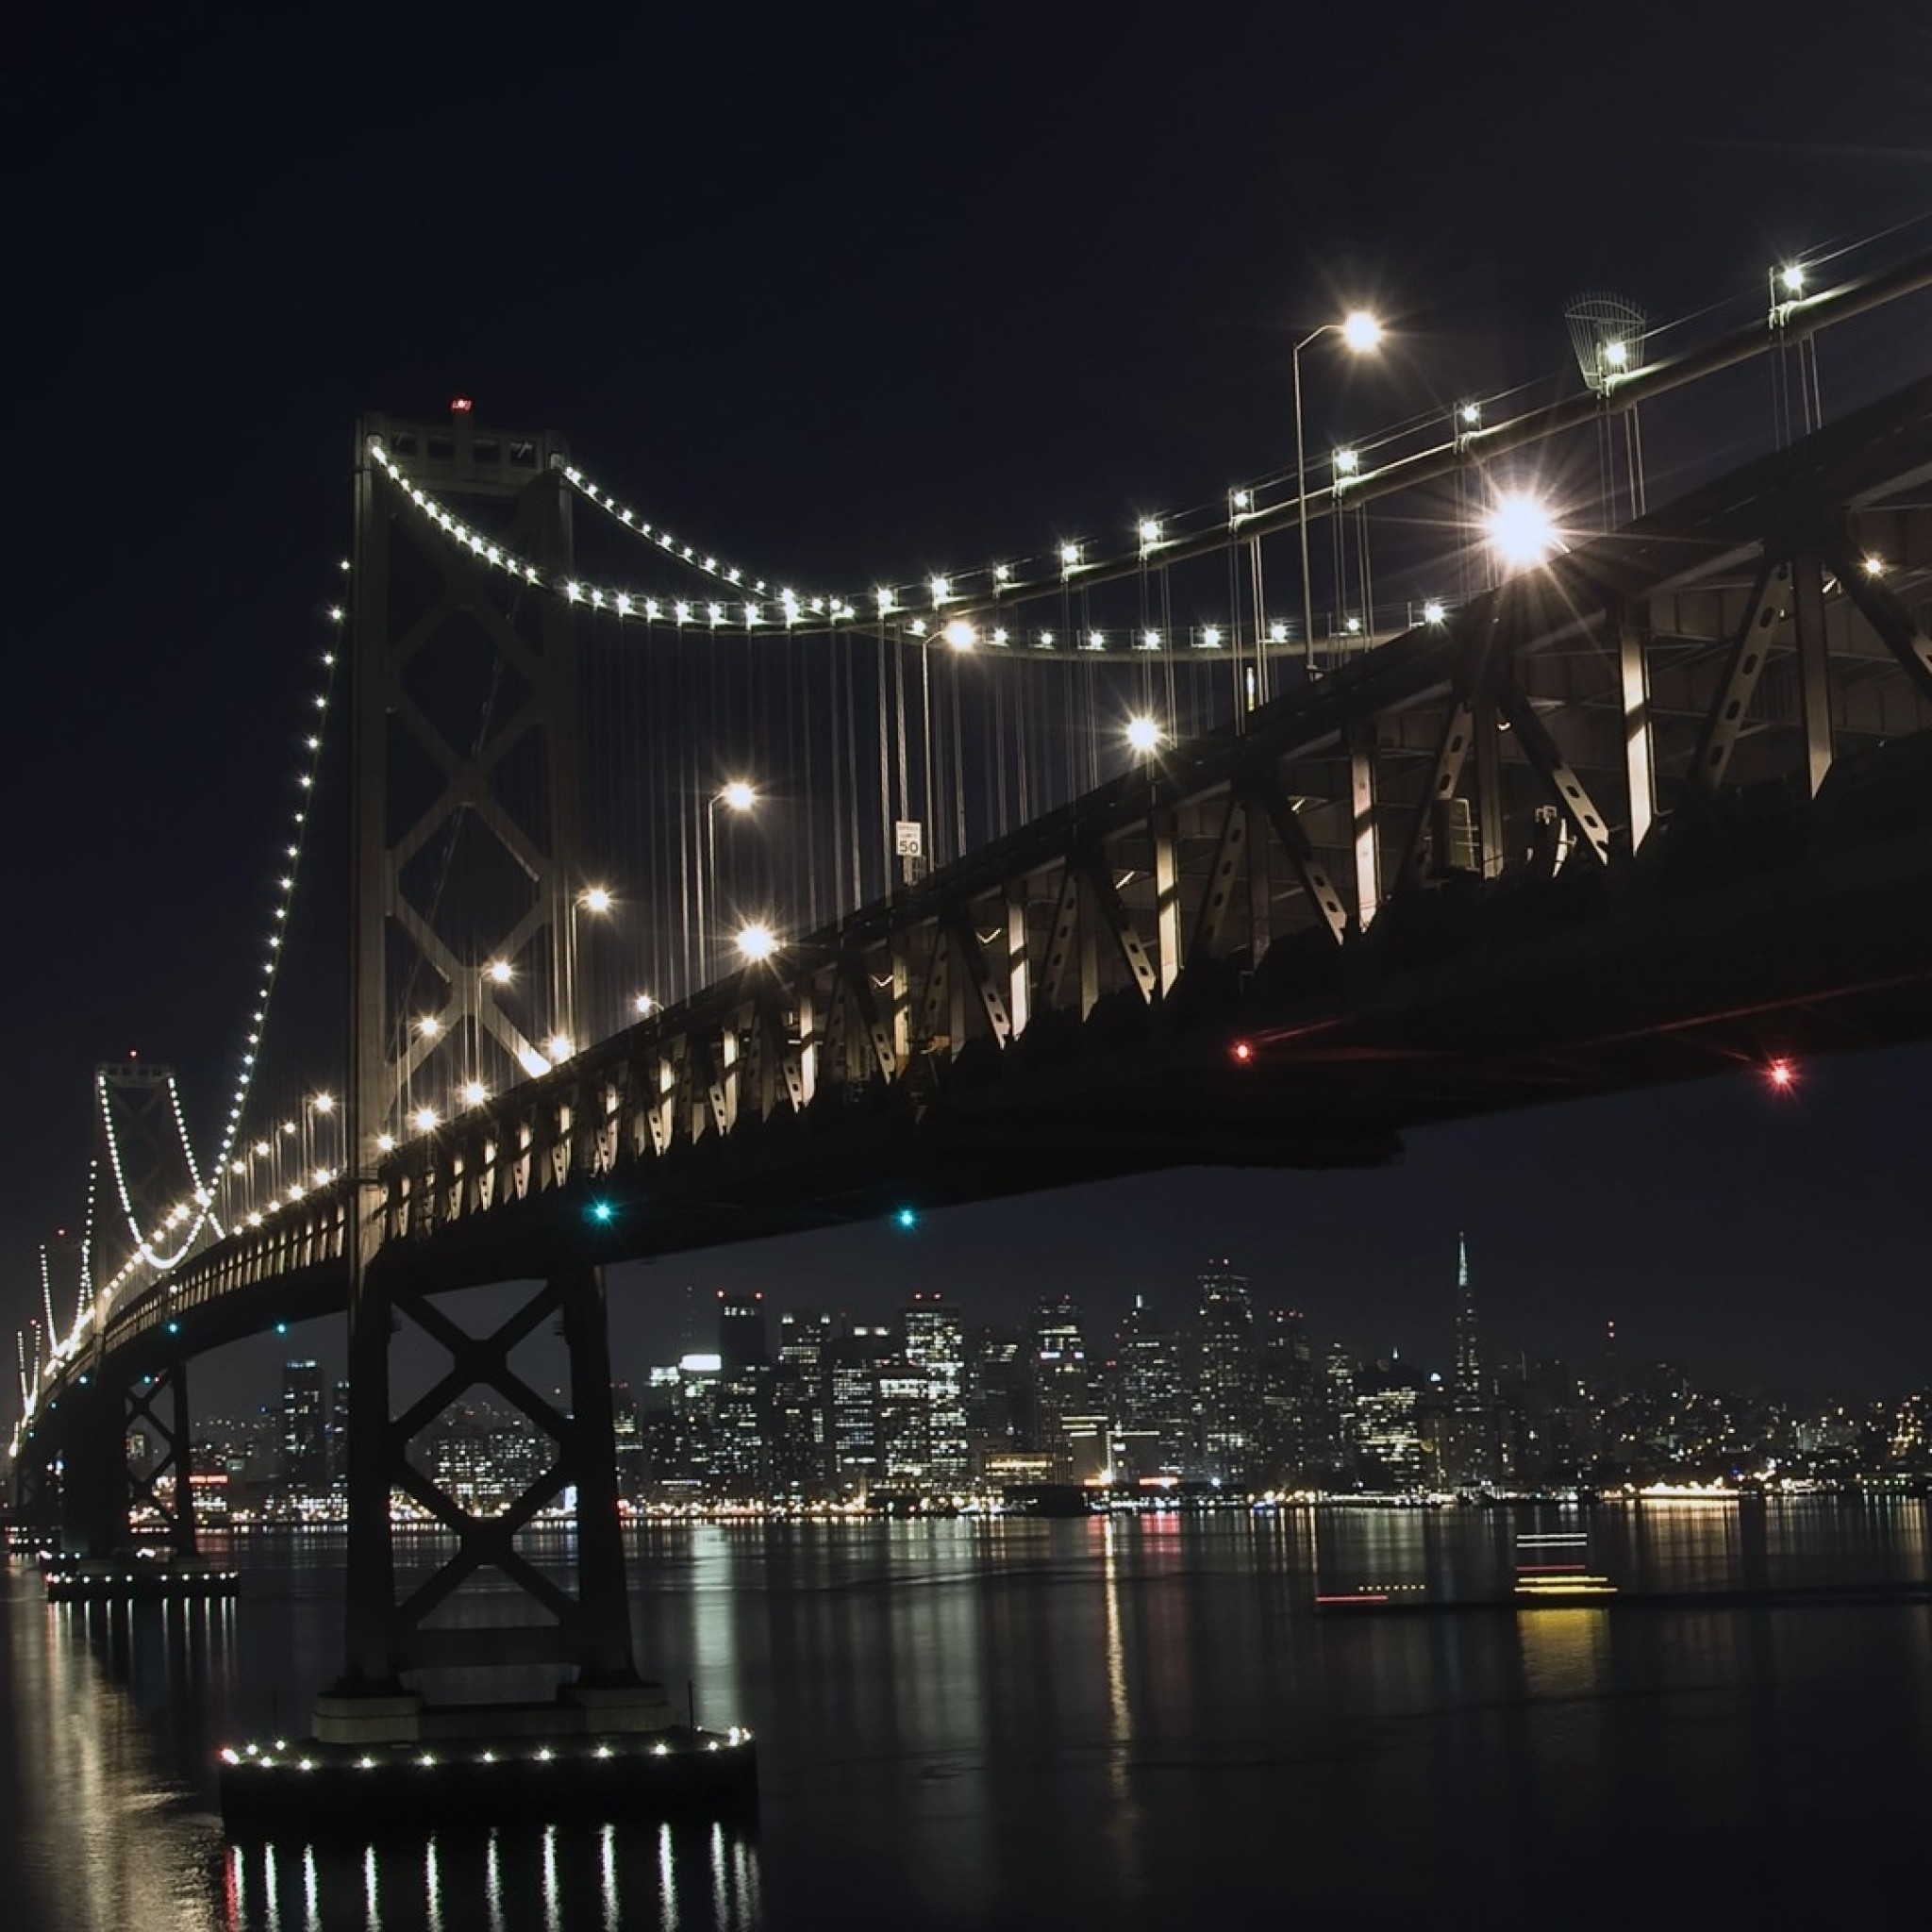 Wallpaper city, bridge, sky, nighttime